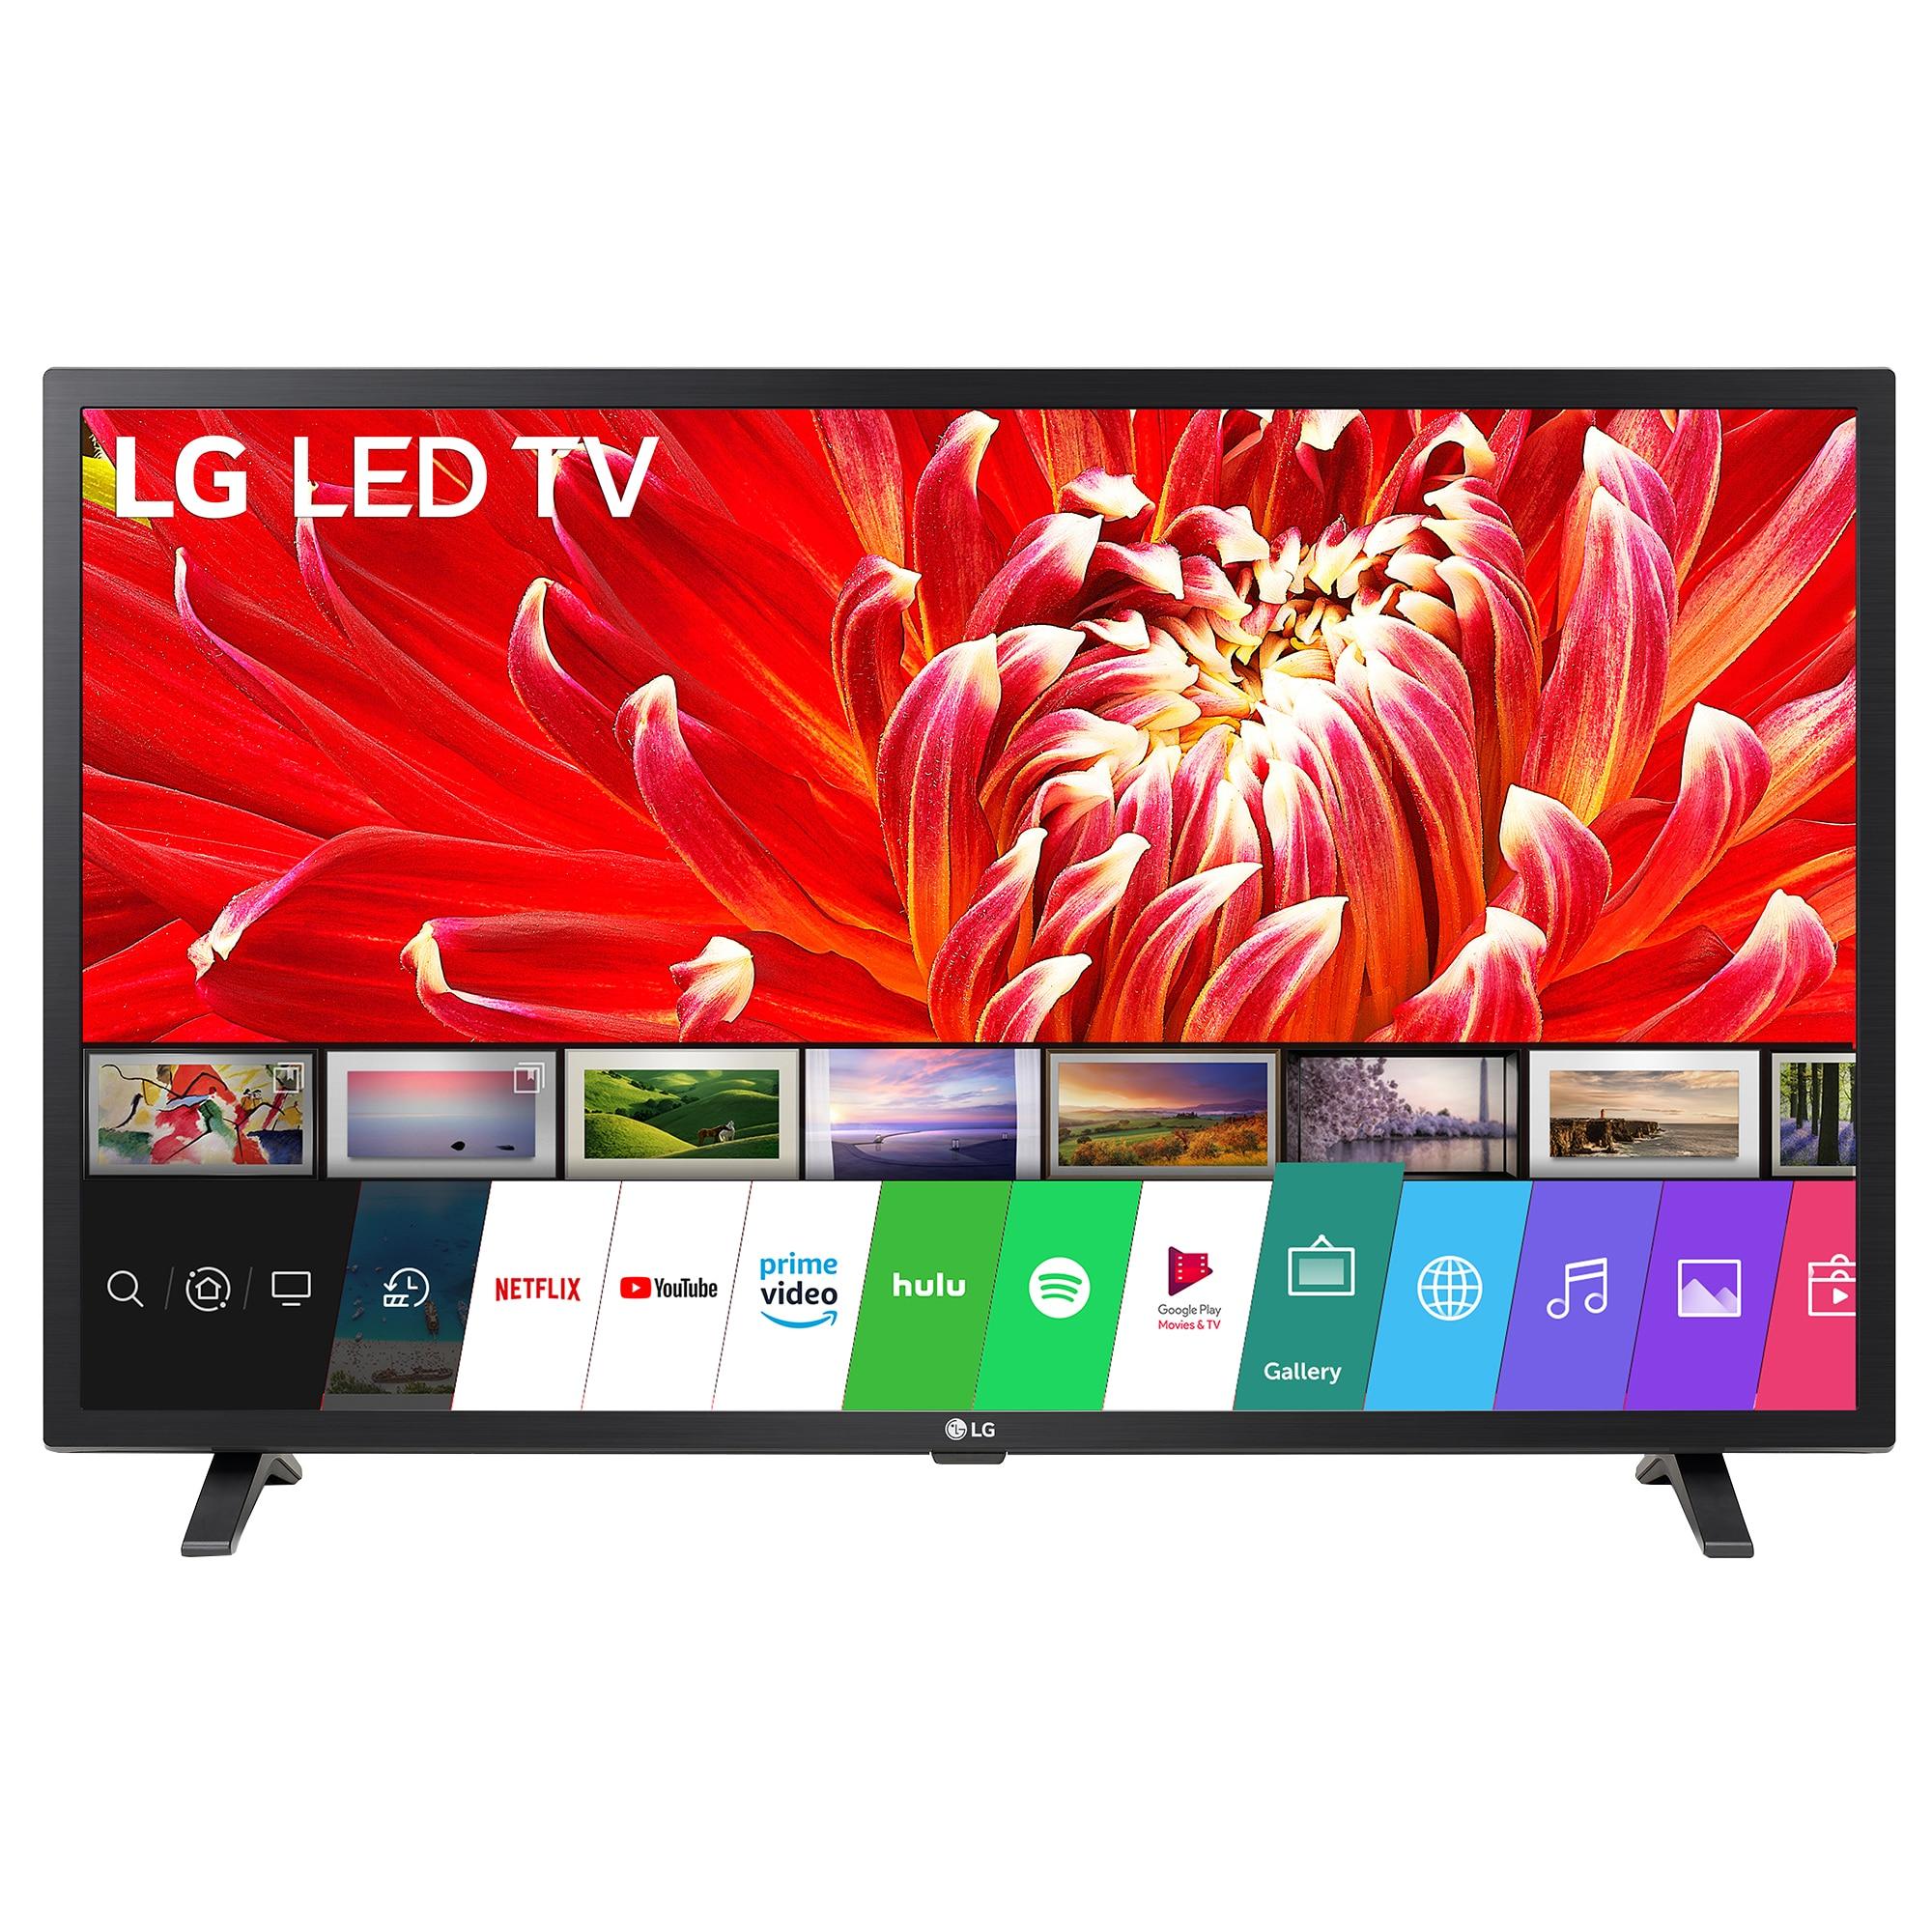 Fotografie Televizor LED Smart LG, 80 cm, 32LM6300PLA, Full HD, Clasa G